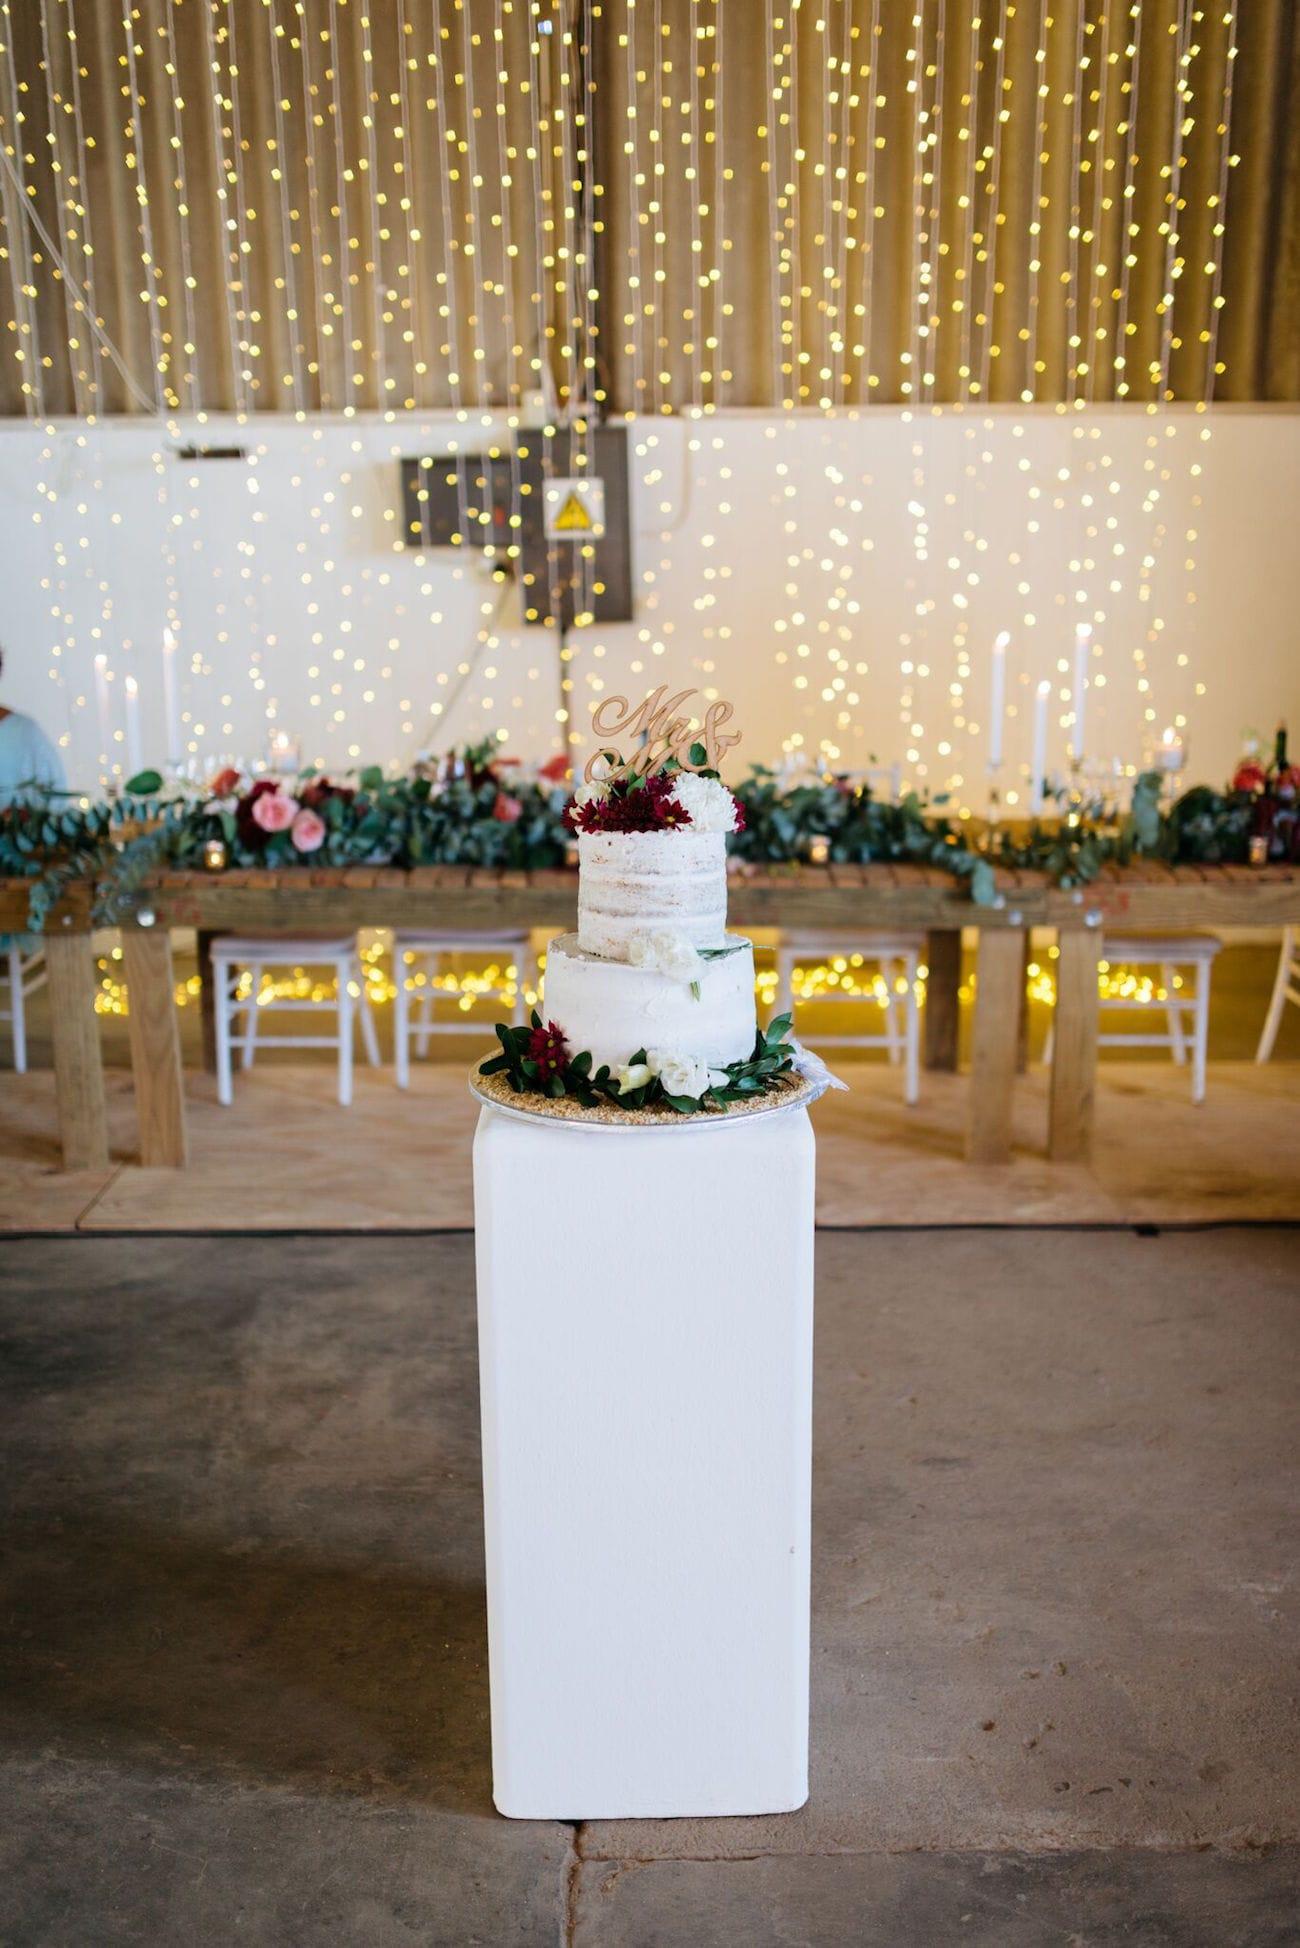 Semi-naked wedding cake with twinkle light backdrop | Credit: Matthew Carr